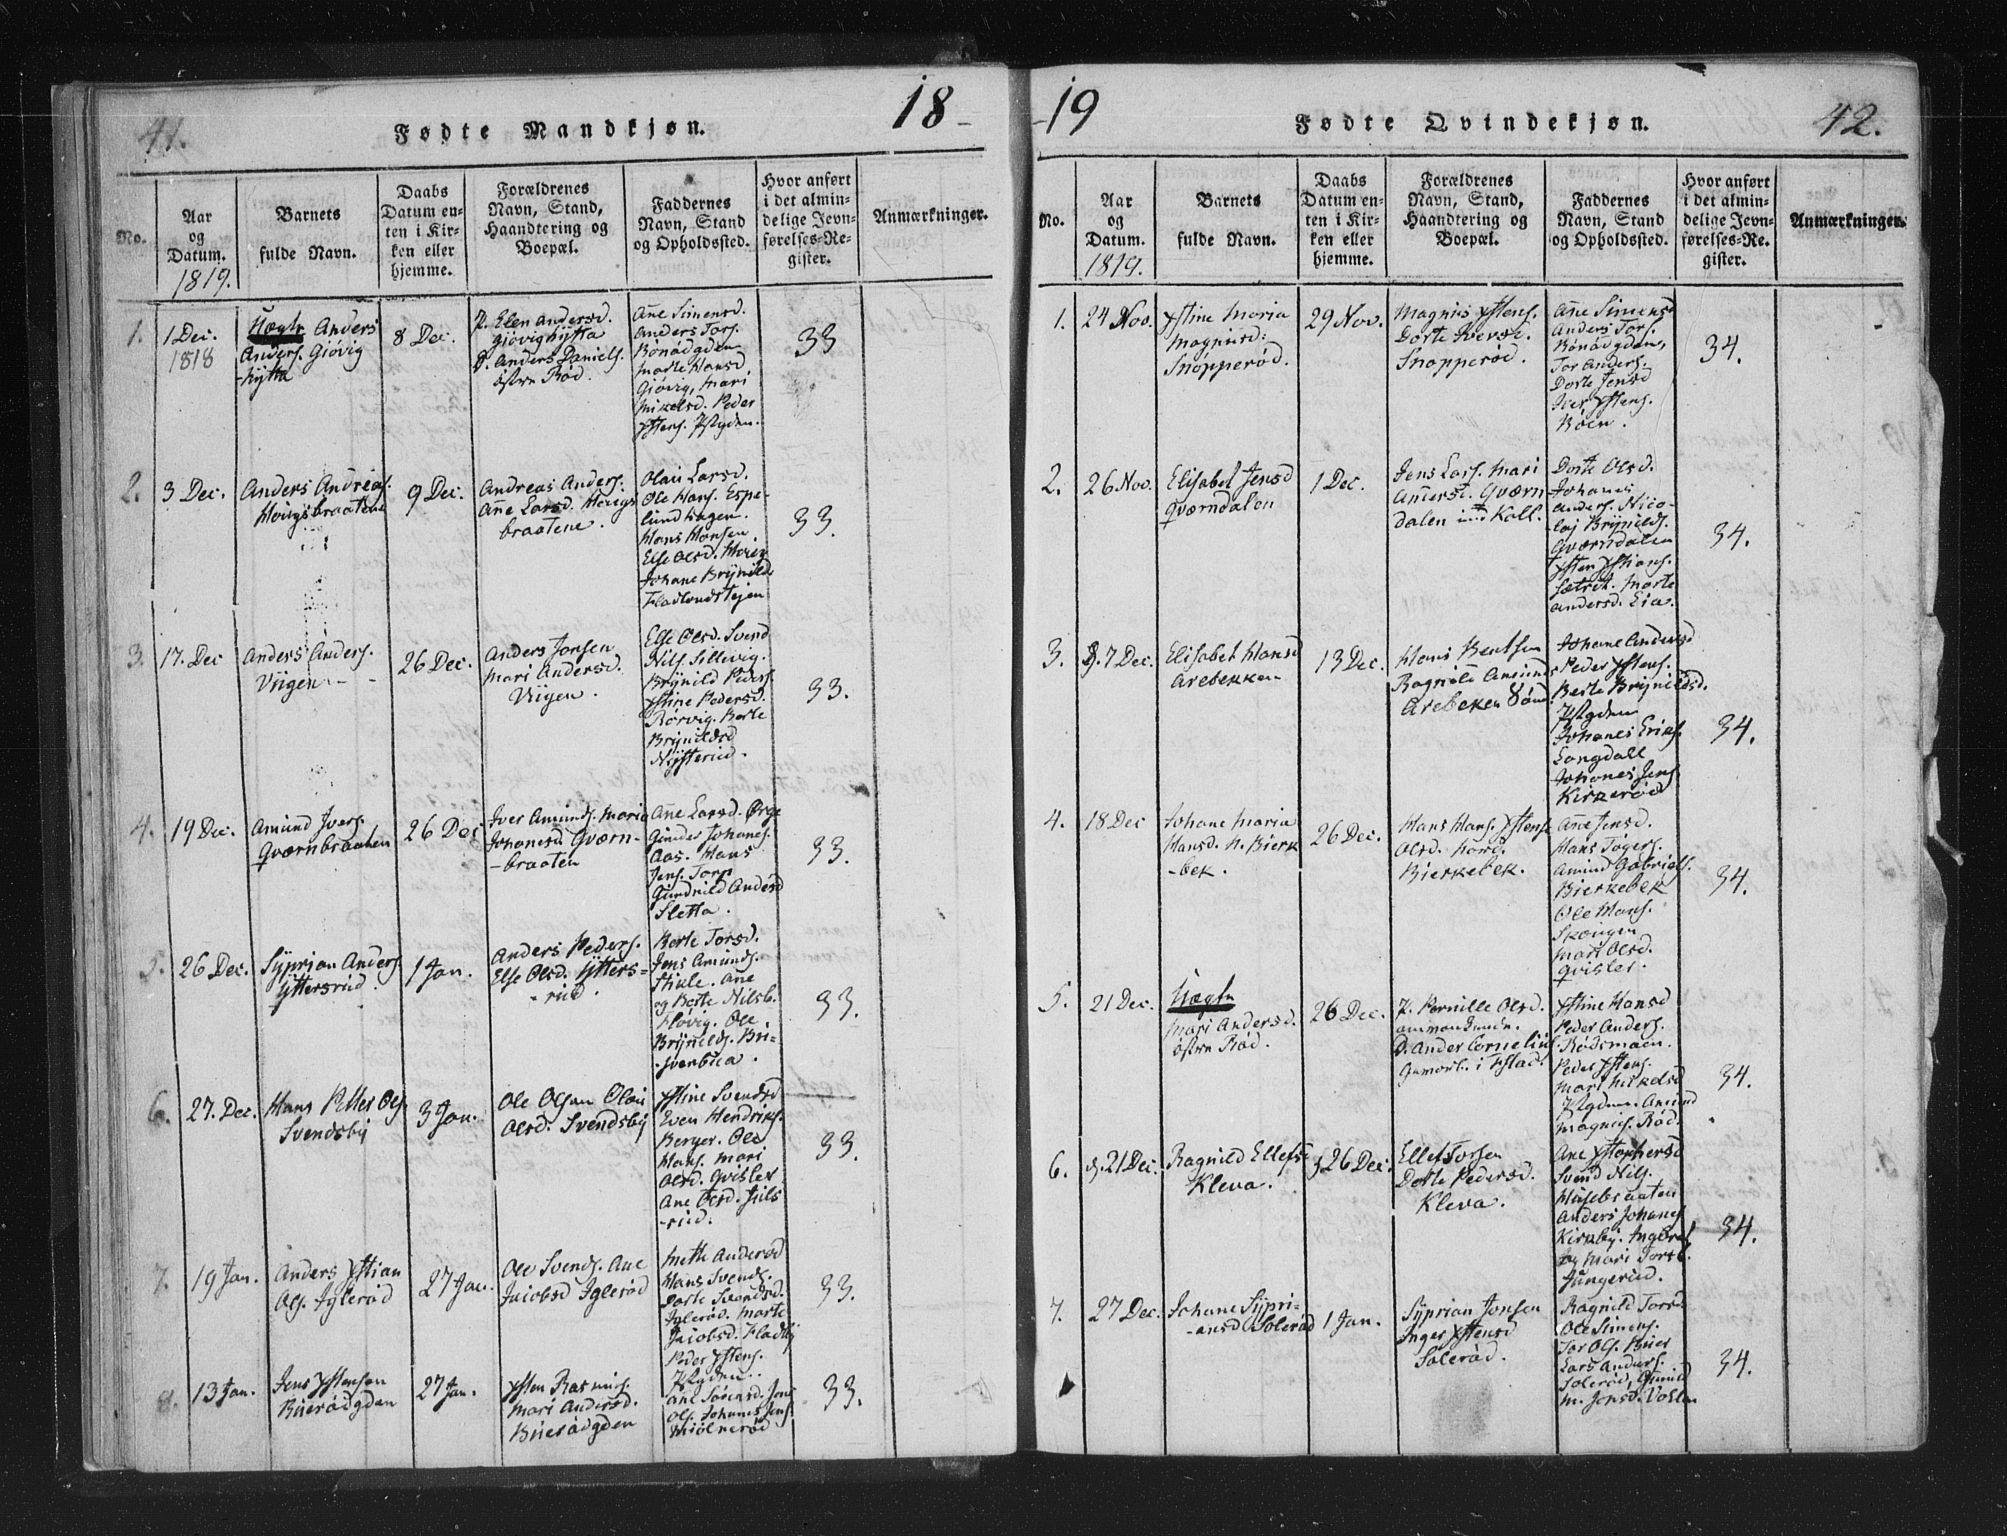 SAO, Aremark prestekontor Kirkebøker, F/Fc/L0001: Ministerialbok nr. III 1, 1814-1834, s. 41-42